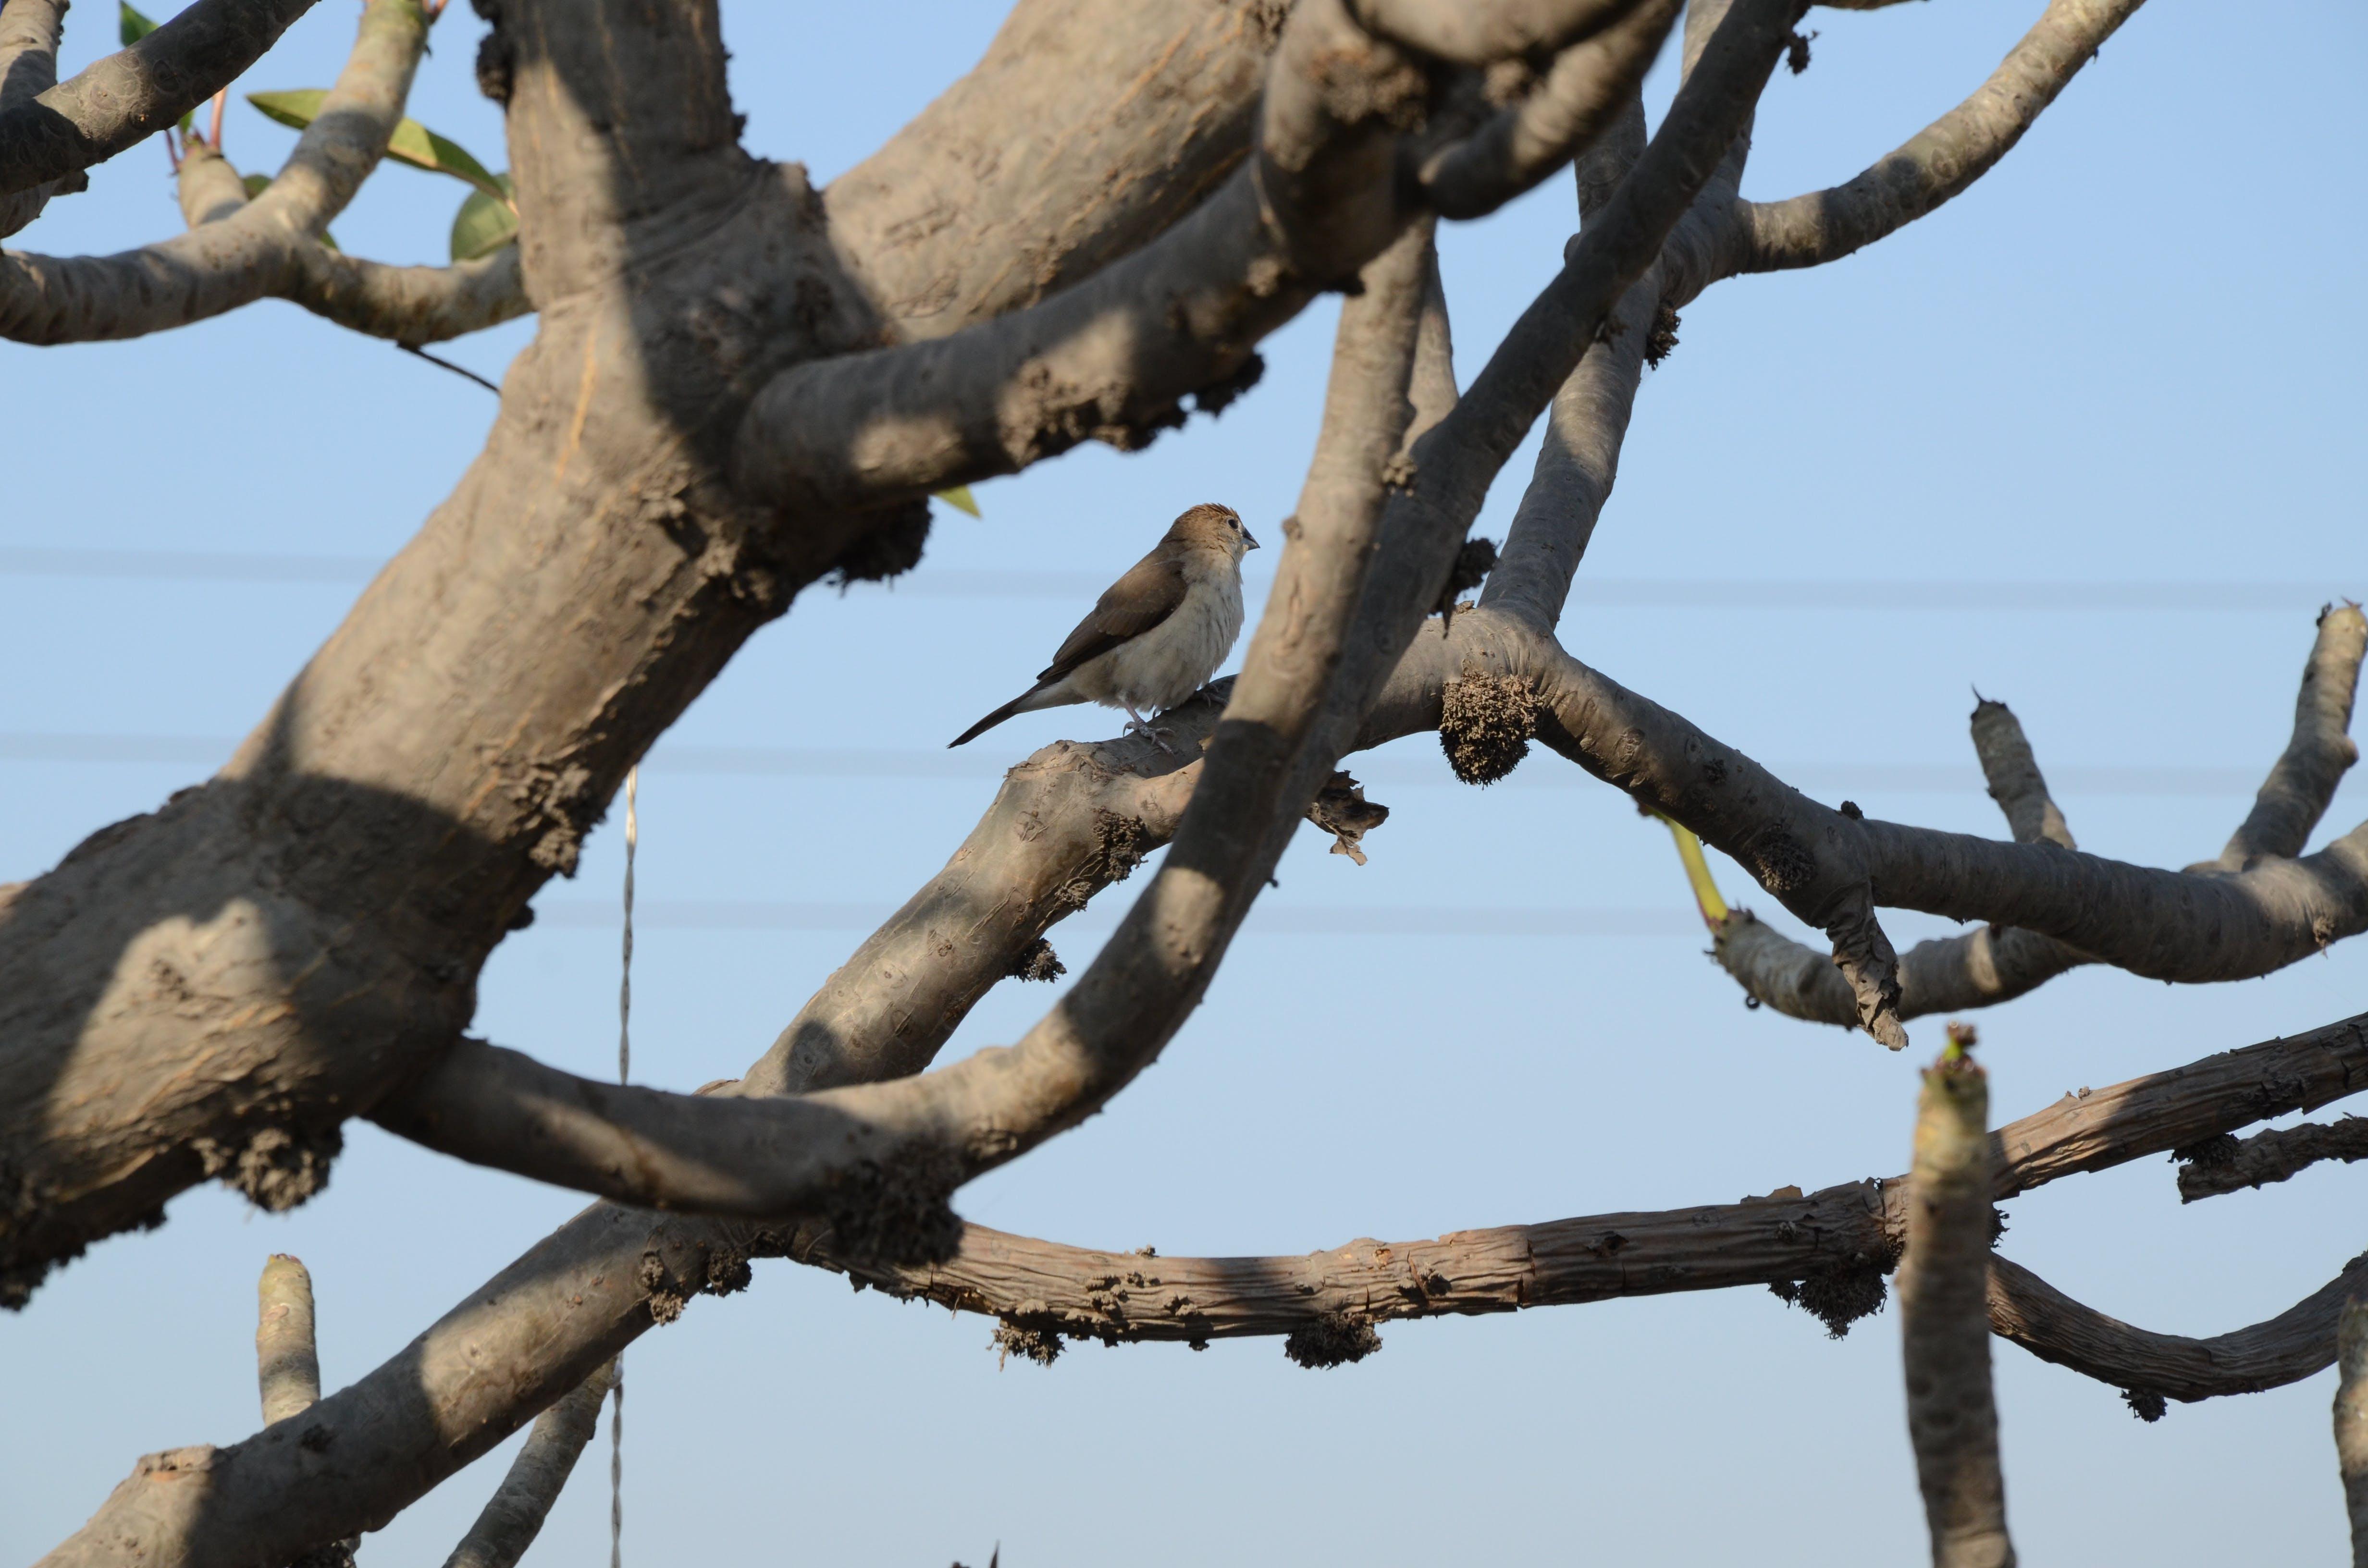 Brown Bird on Tree Branch